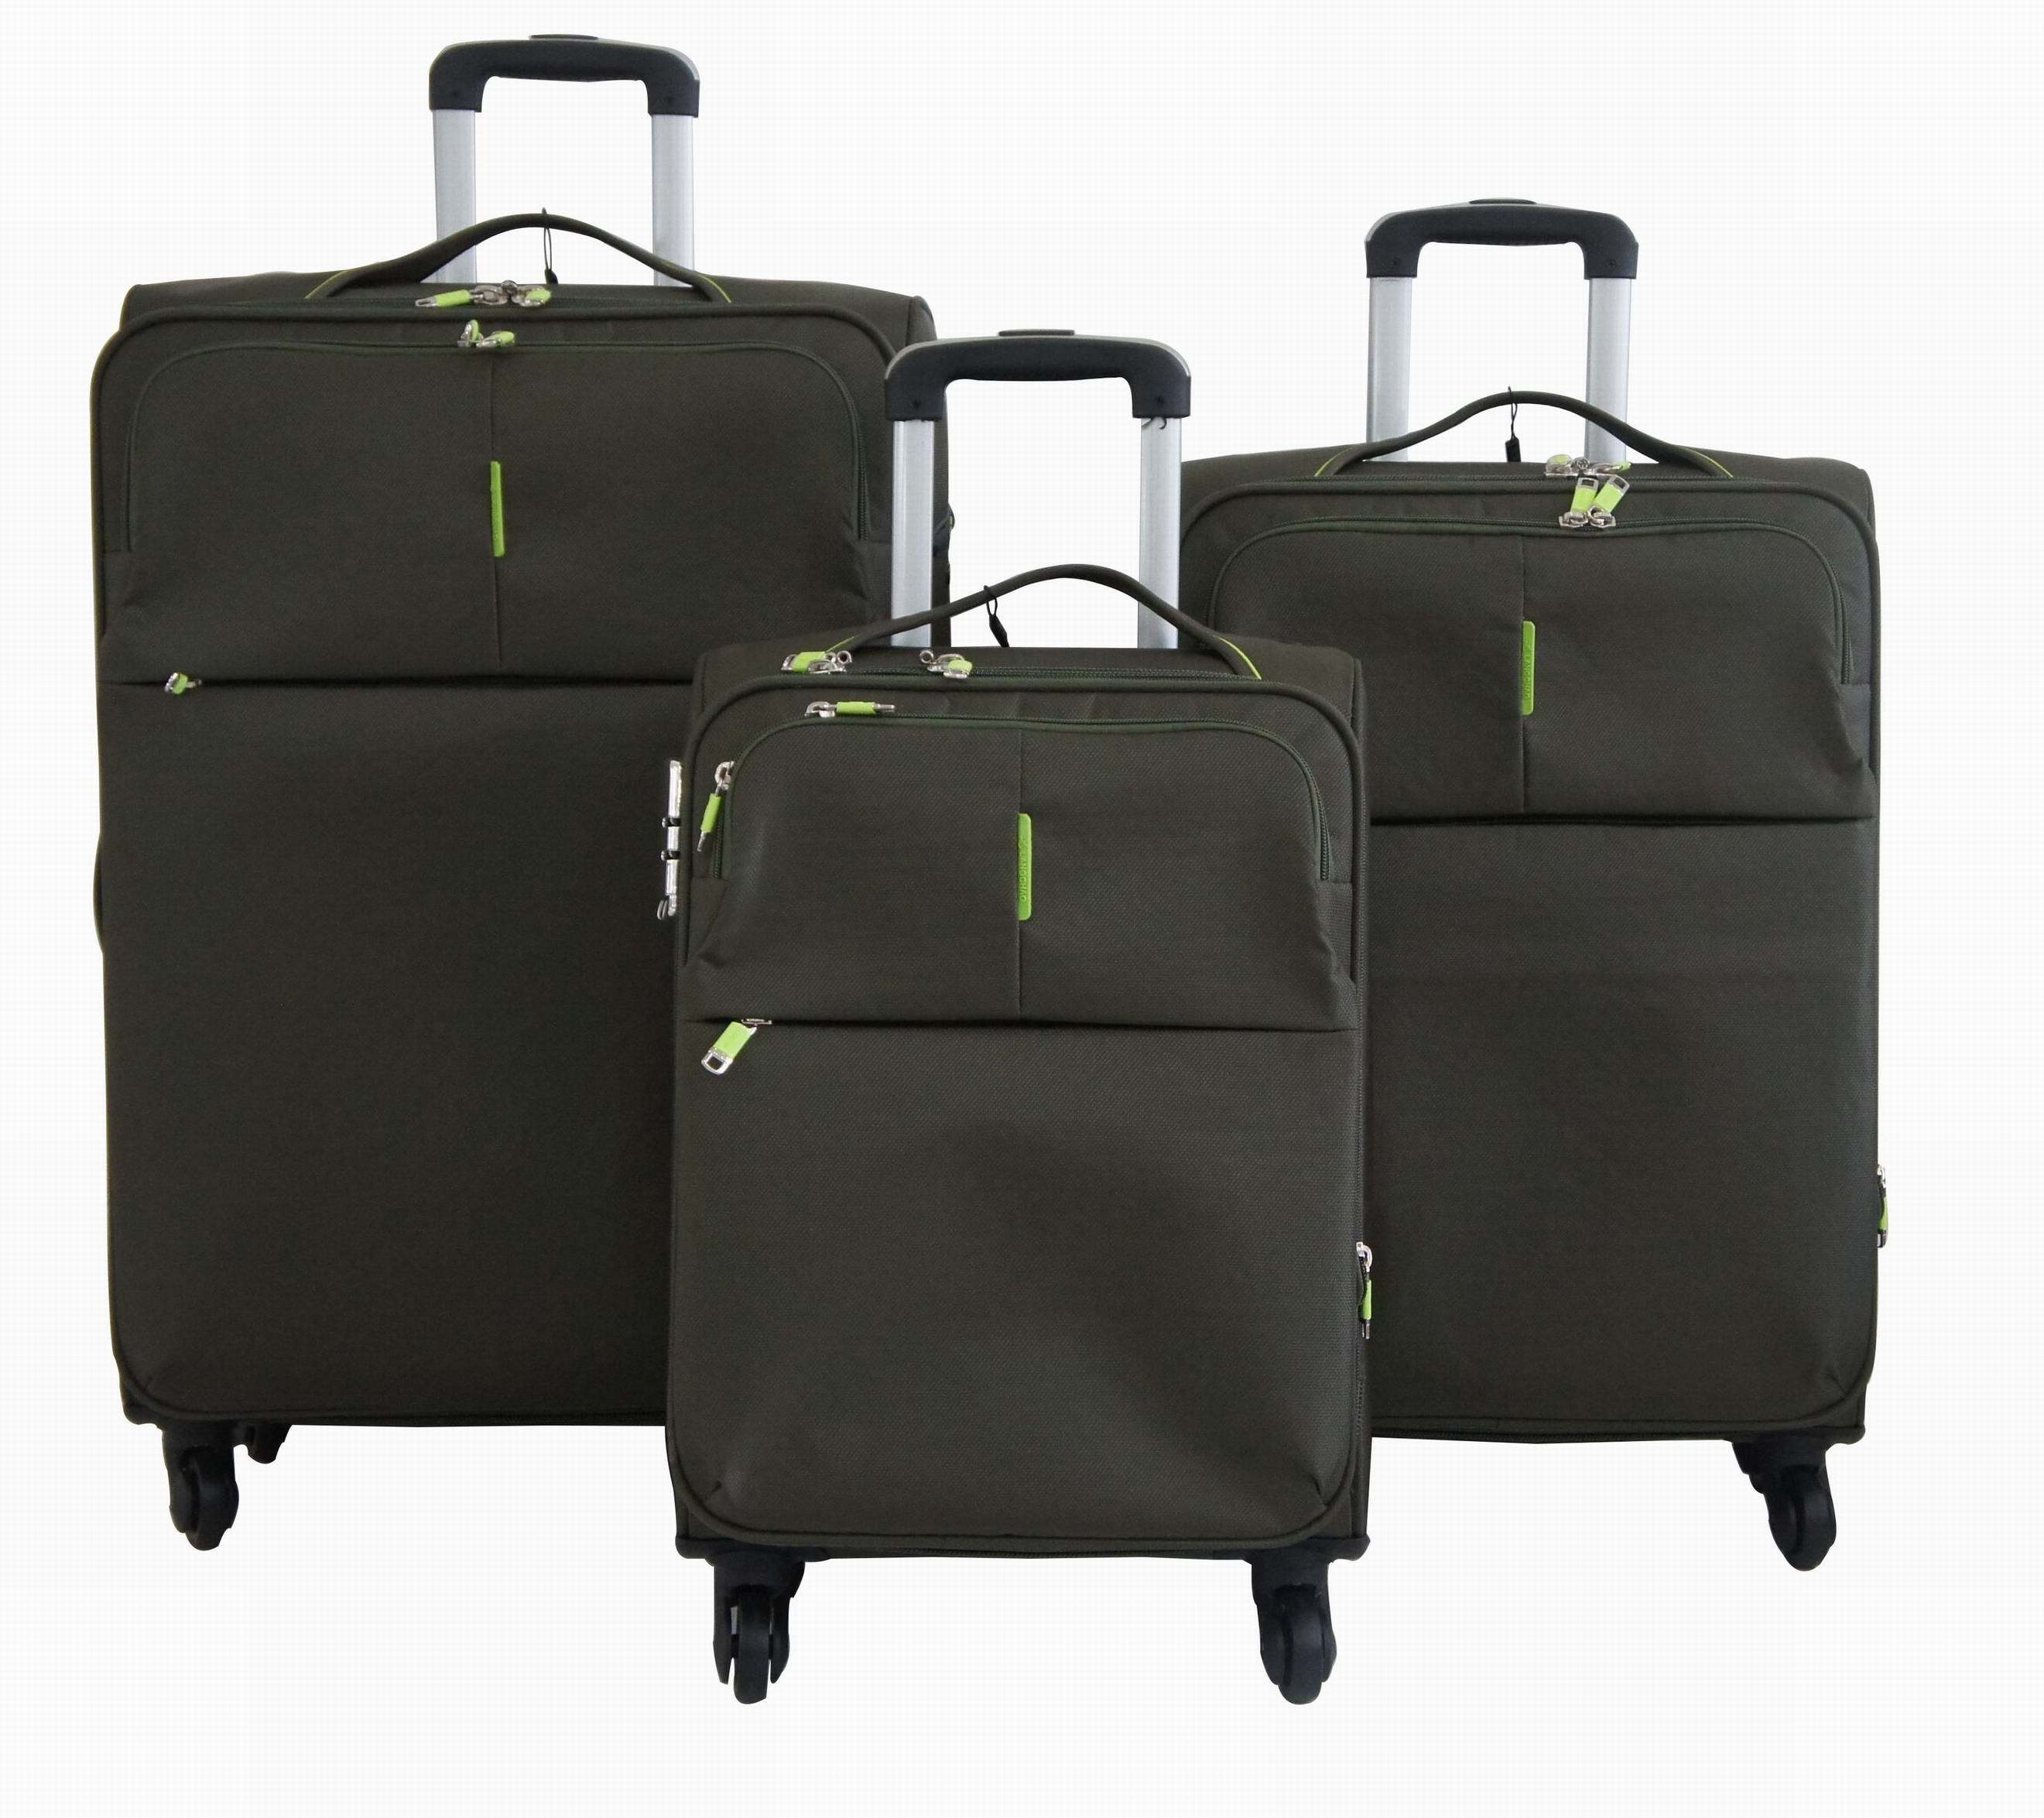 Nylon Soft Trolley Case Luggage Bag Suitcase 1jb011